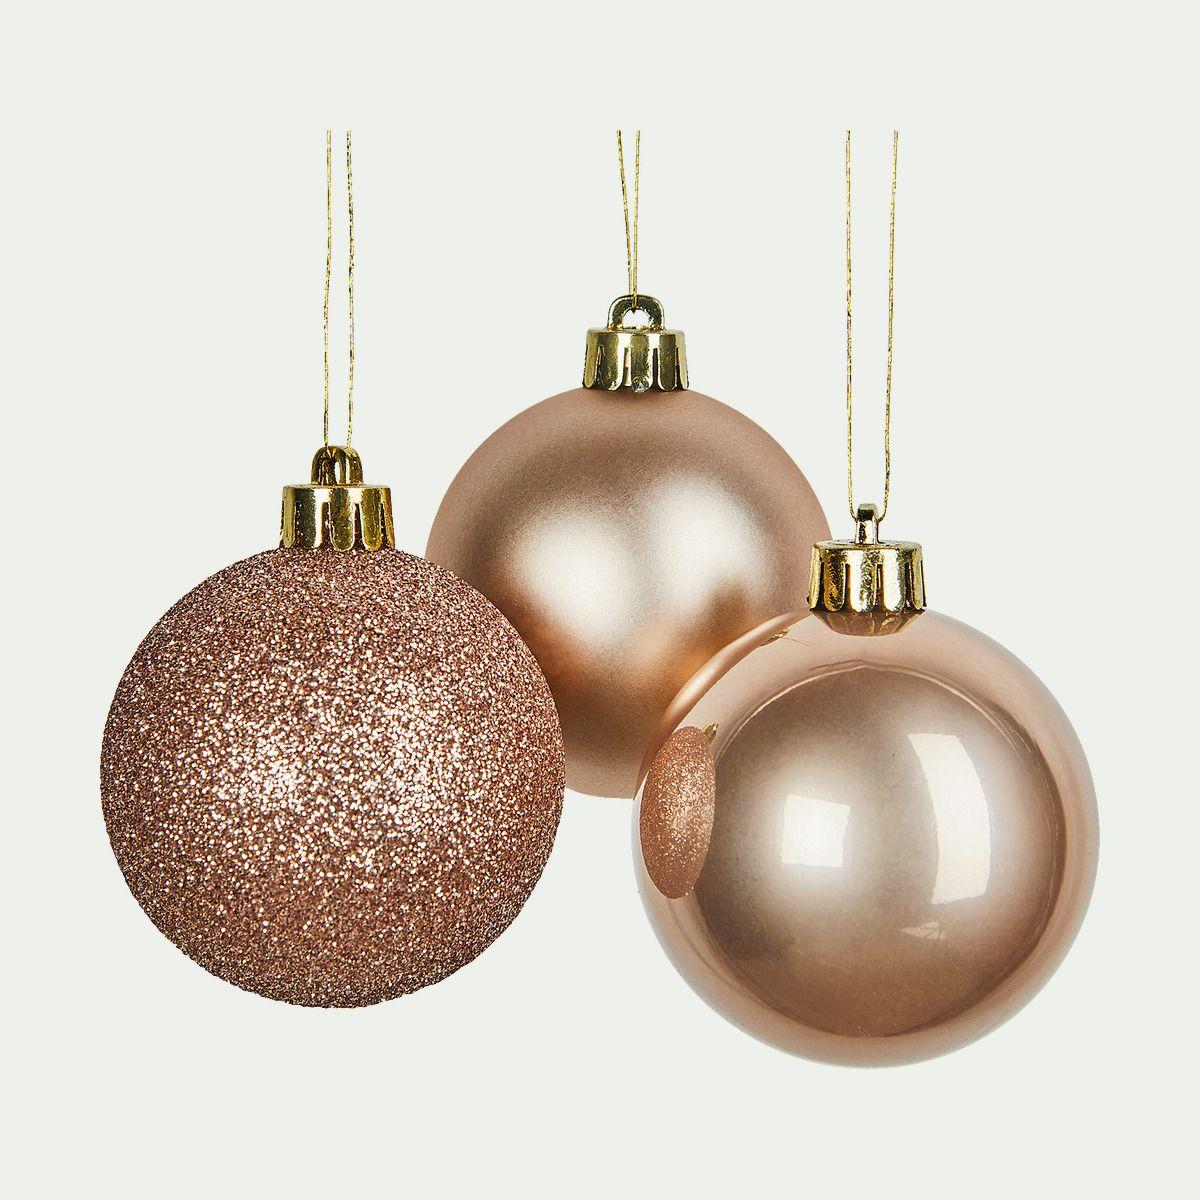 Lot de 10 boules de Noël en verre beige D6cm - BINAN - lots de boules de Noël